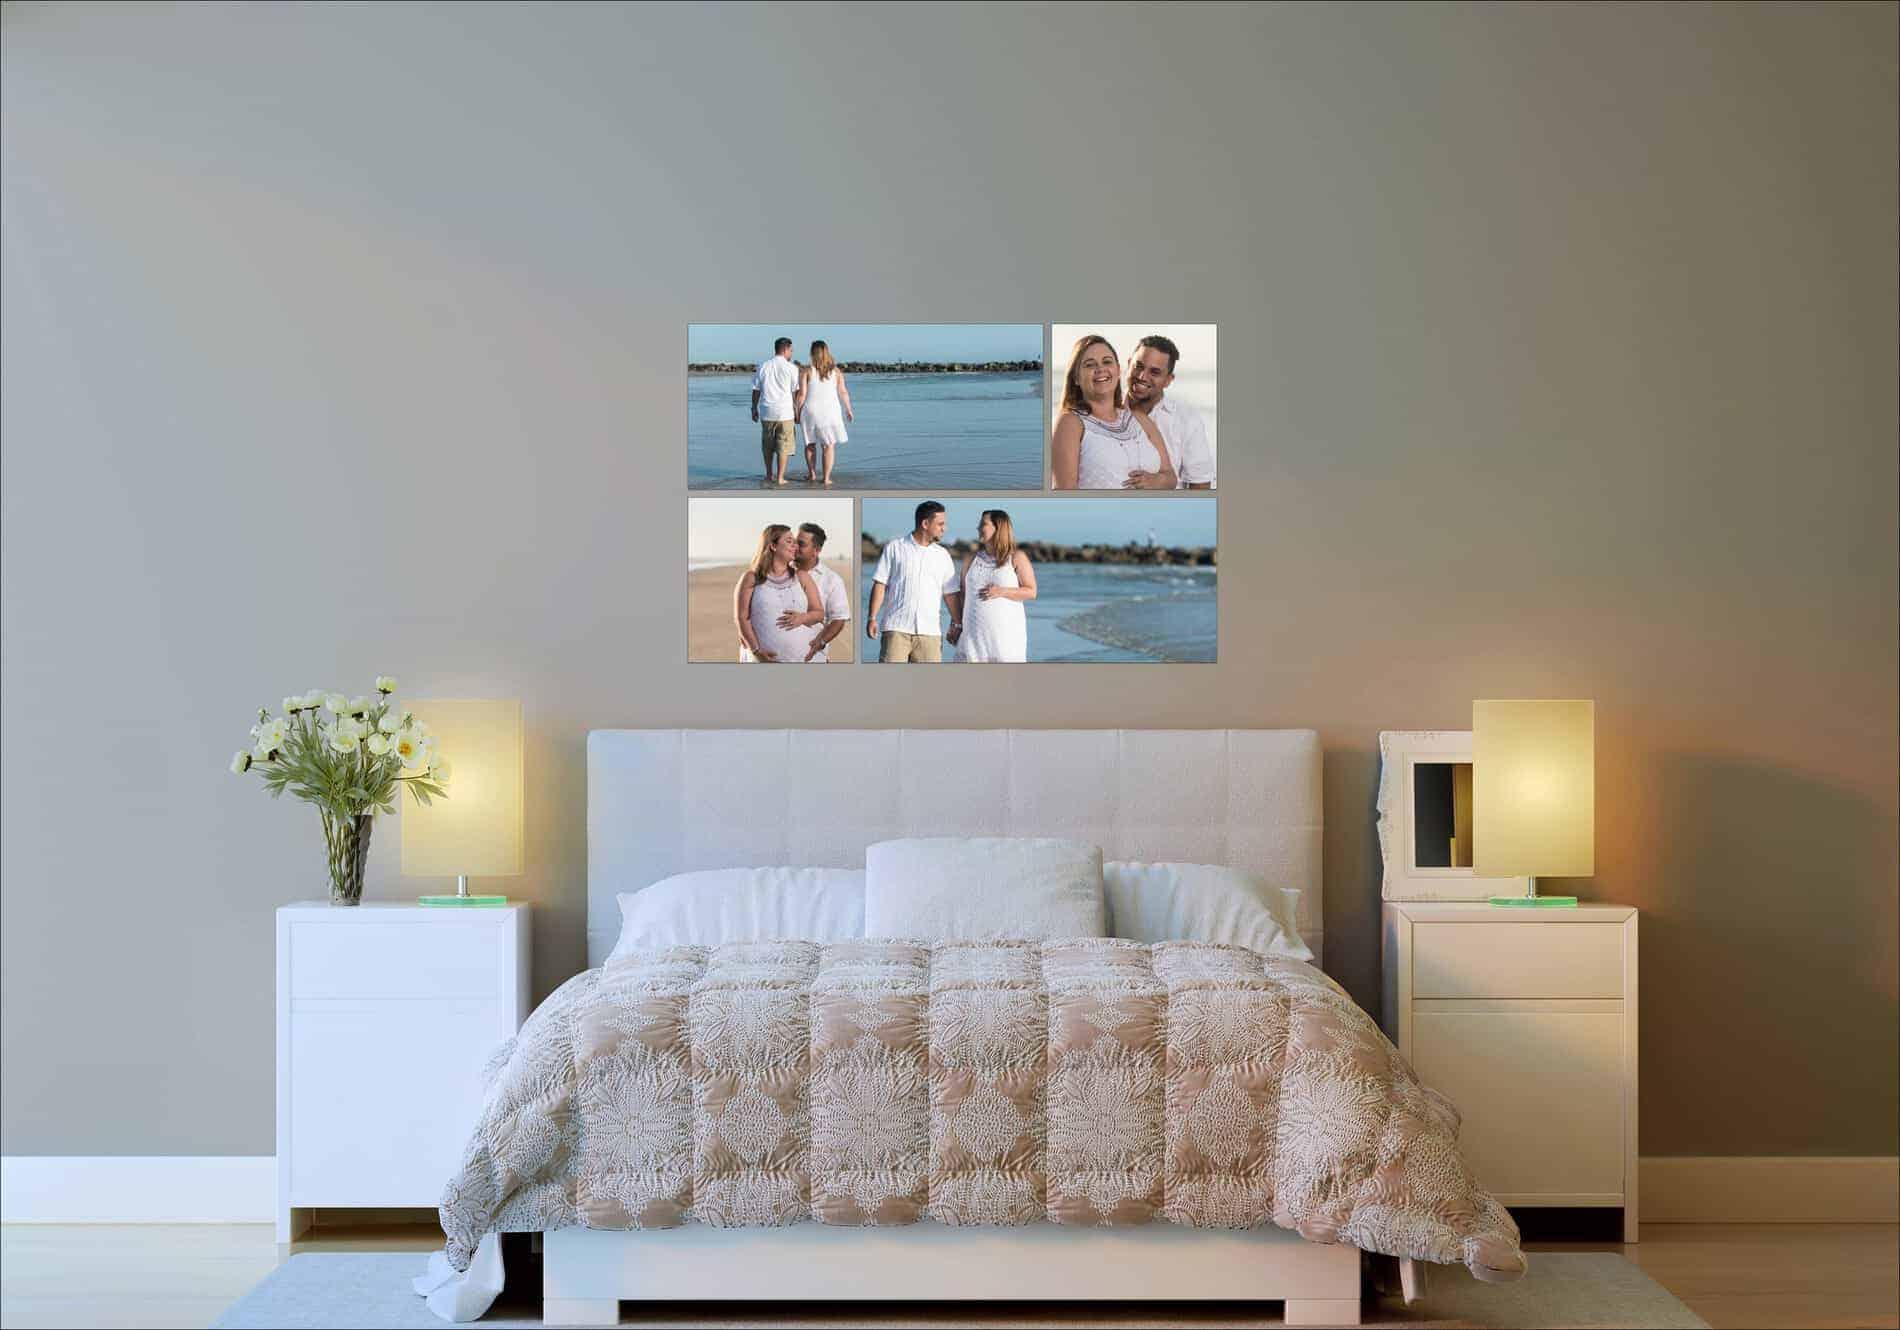 Beach Maternity Photos on bedroom Wall